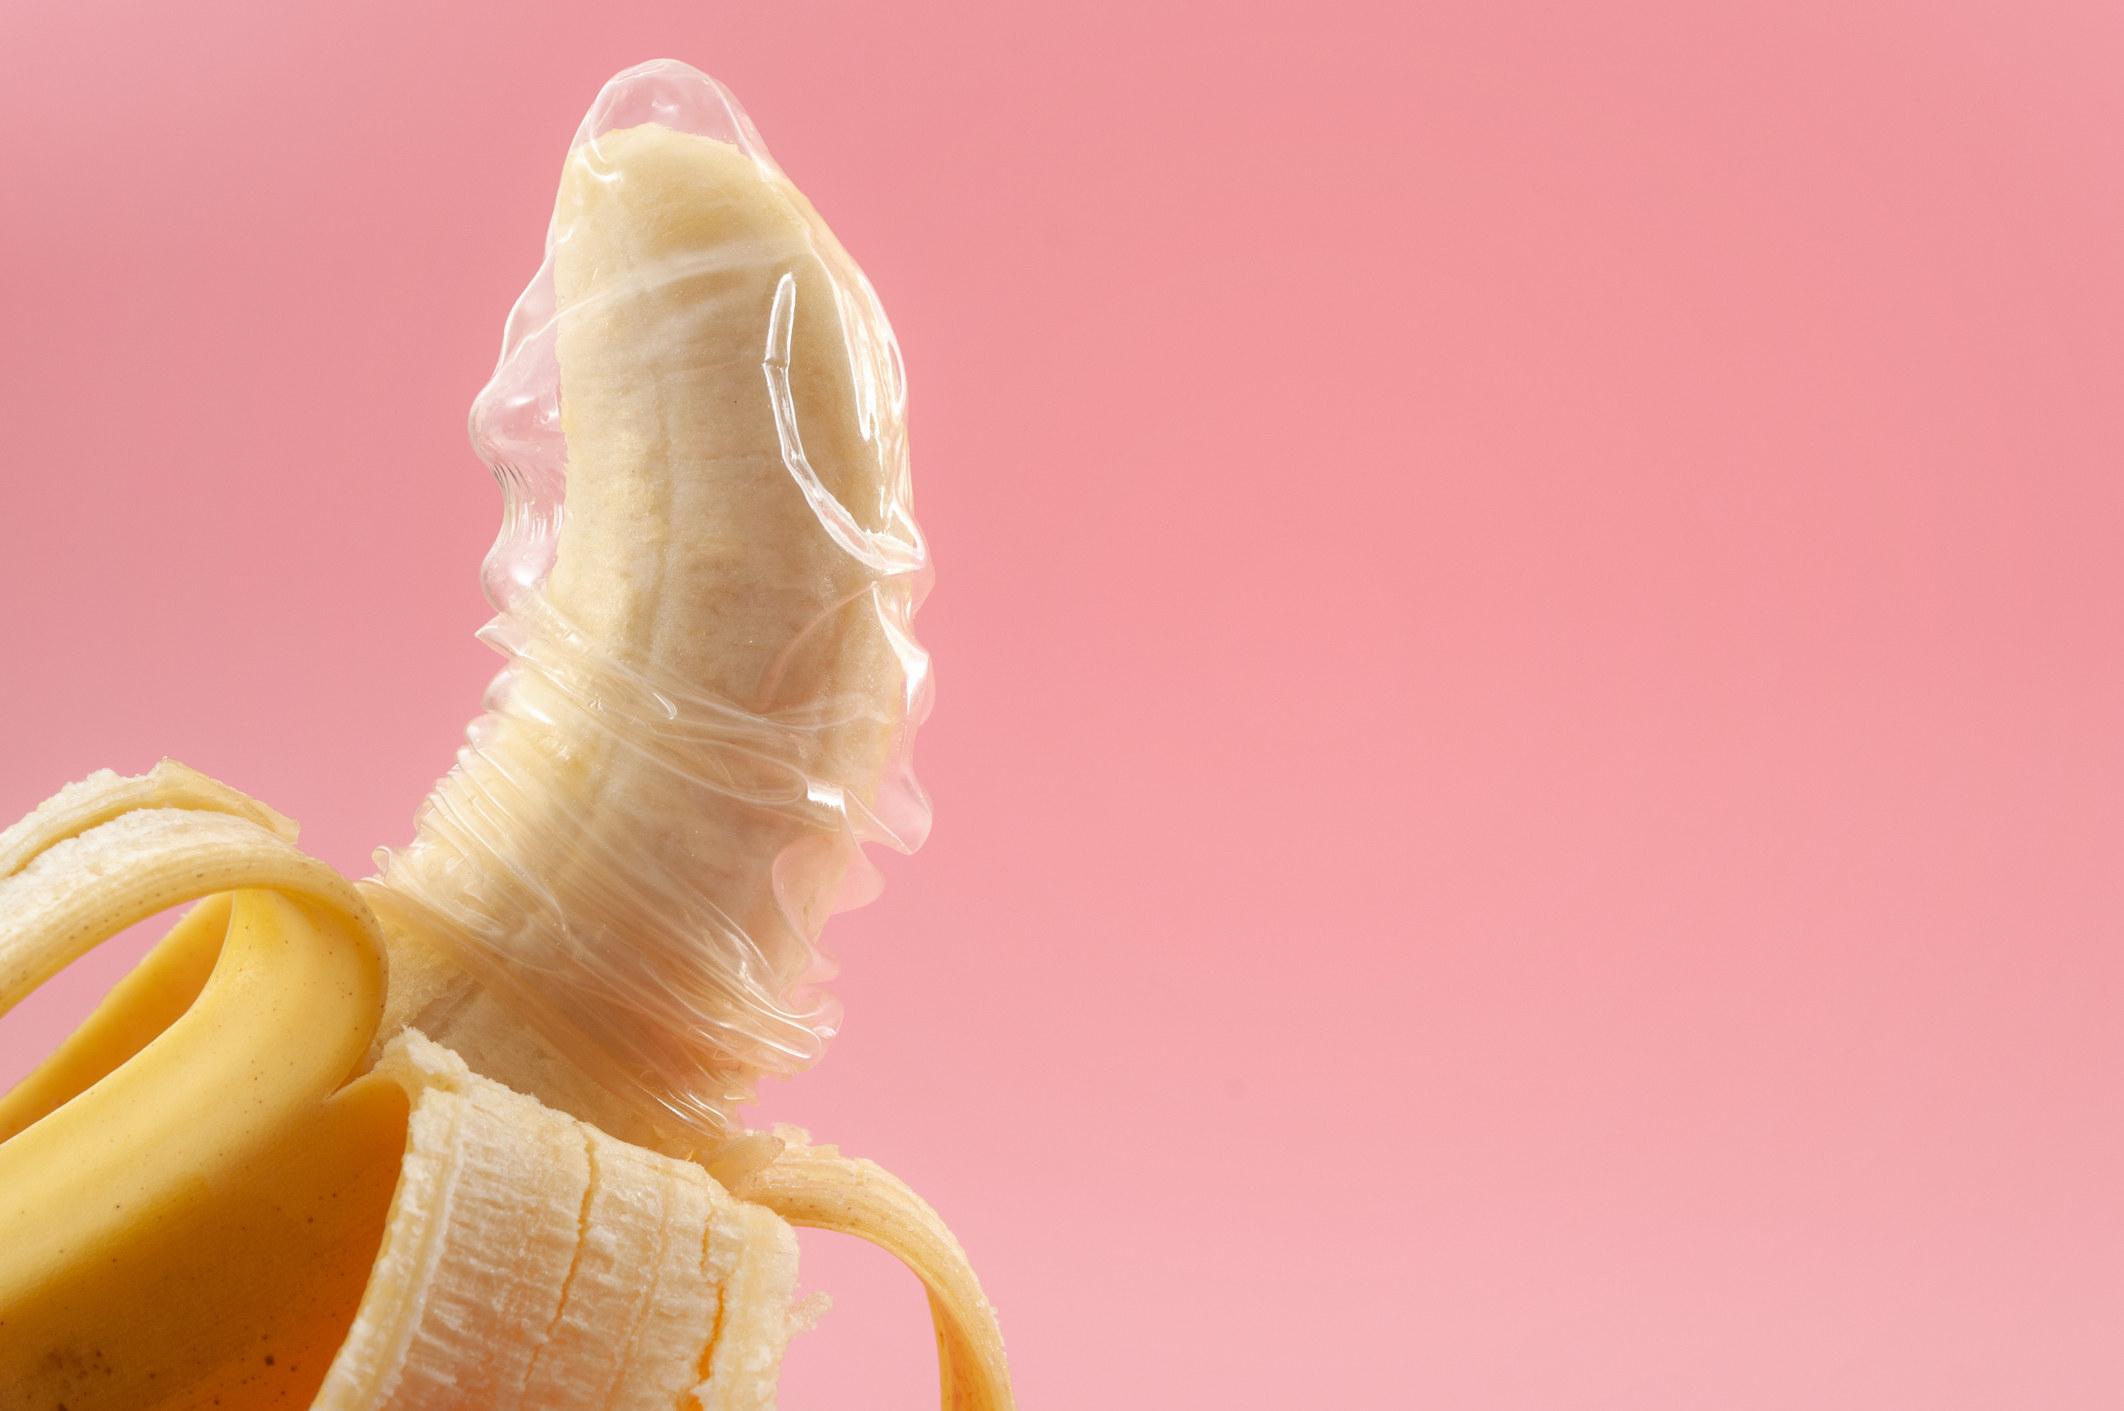 Photo of a condom on a banana